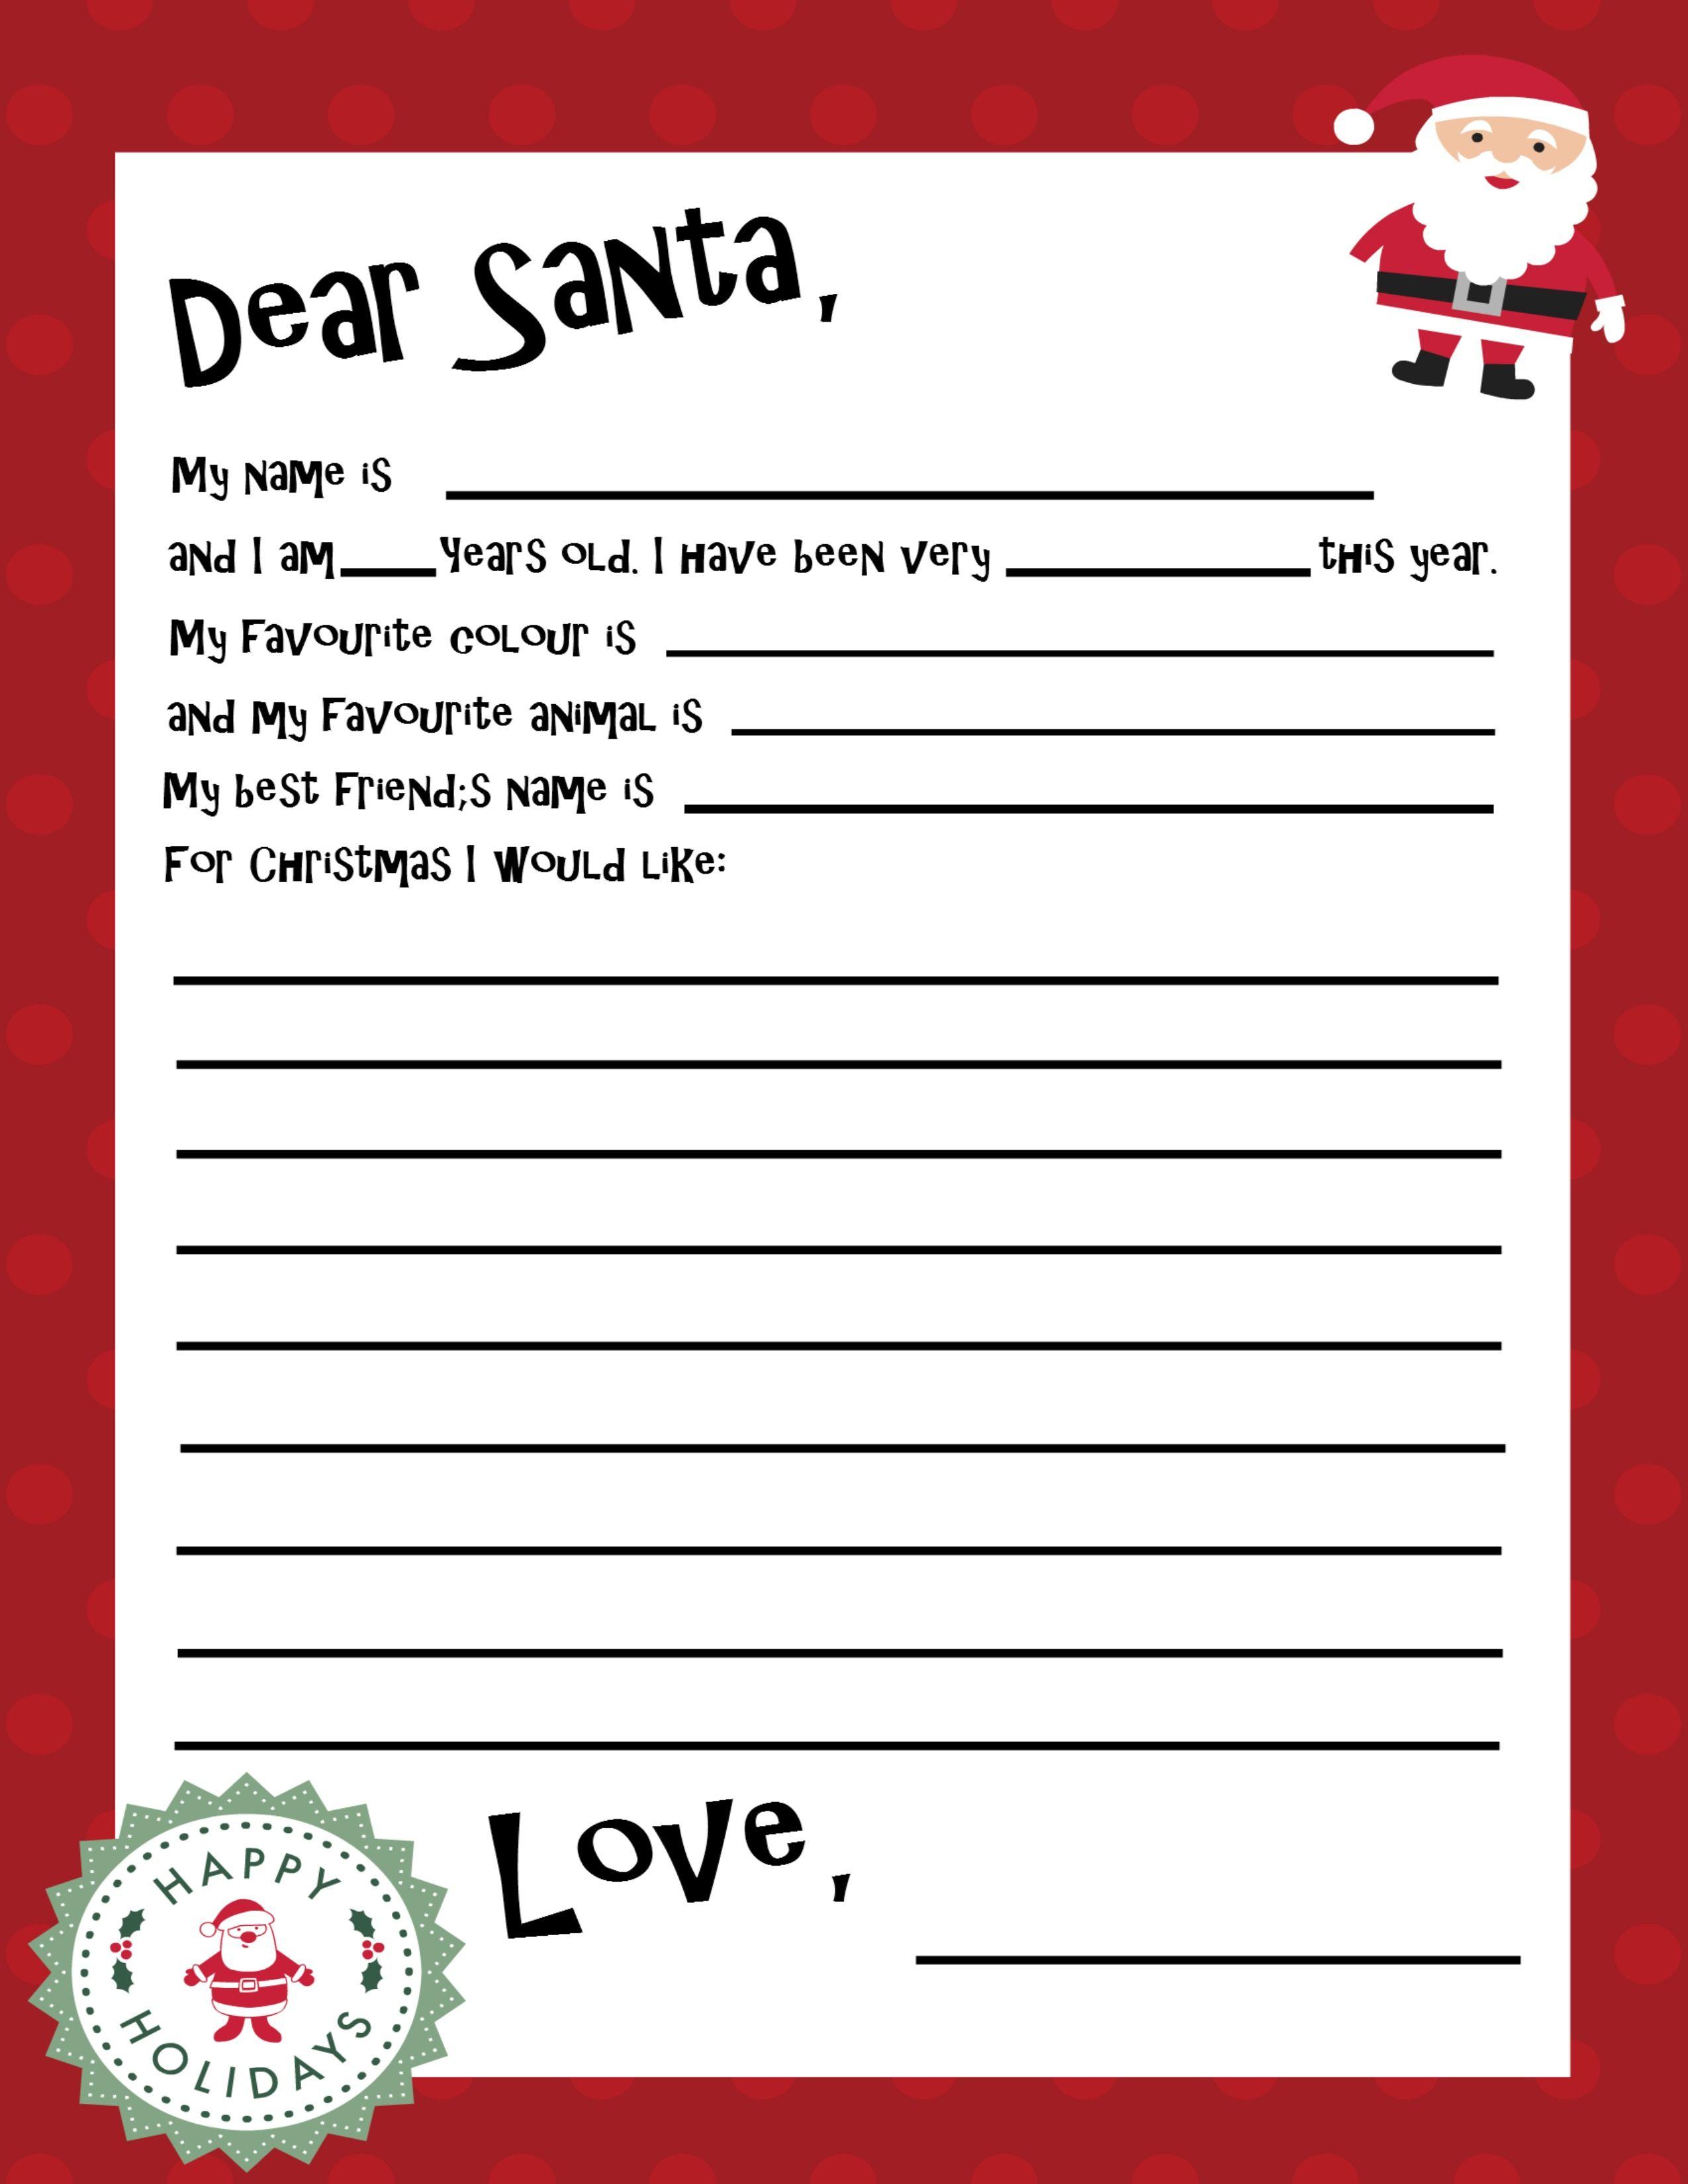 Free Printable Santa Letter Template | Christmas Recipes & Ideas - Free Printable Christmas Letters From Santa